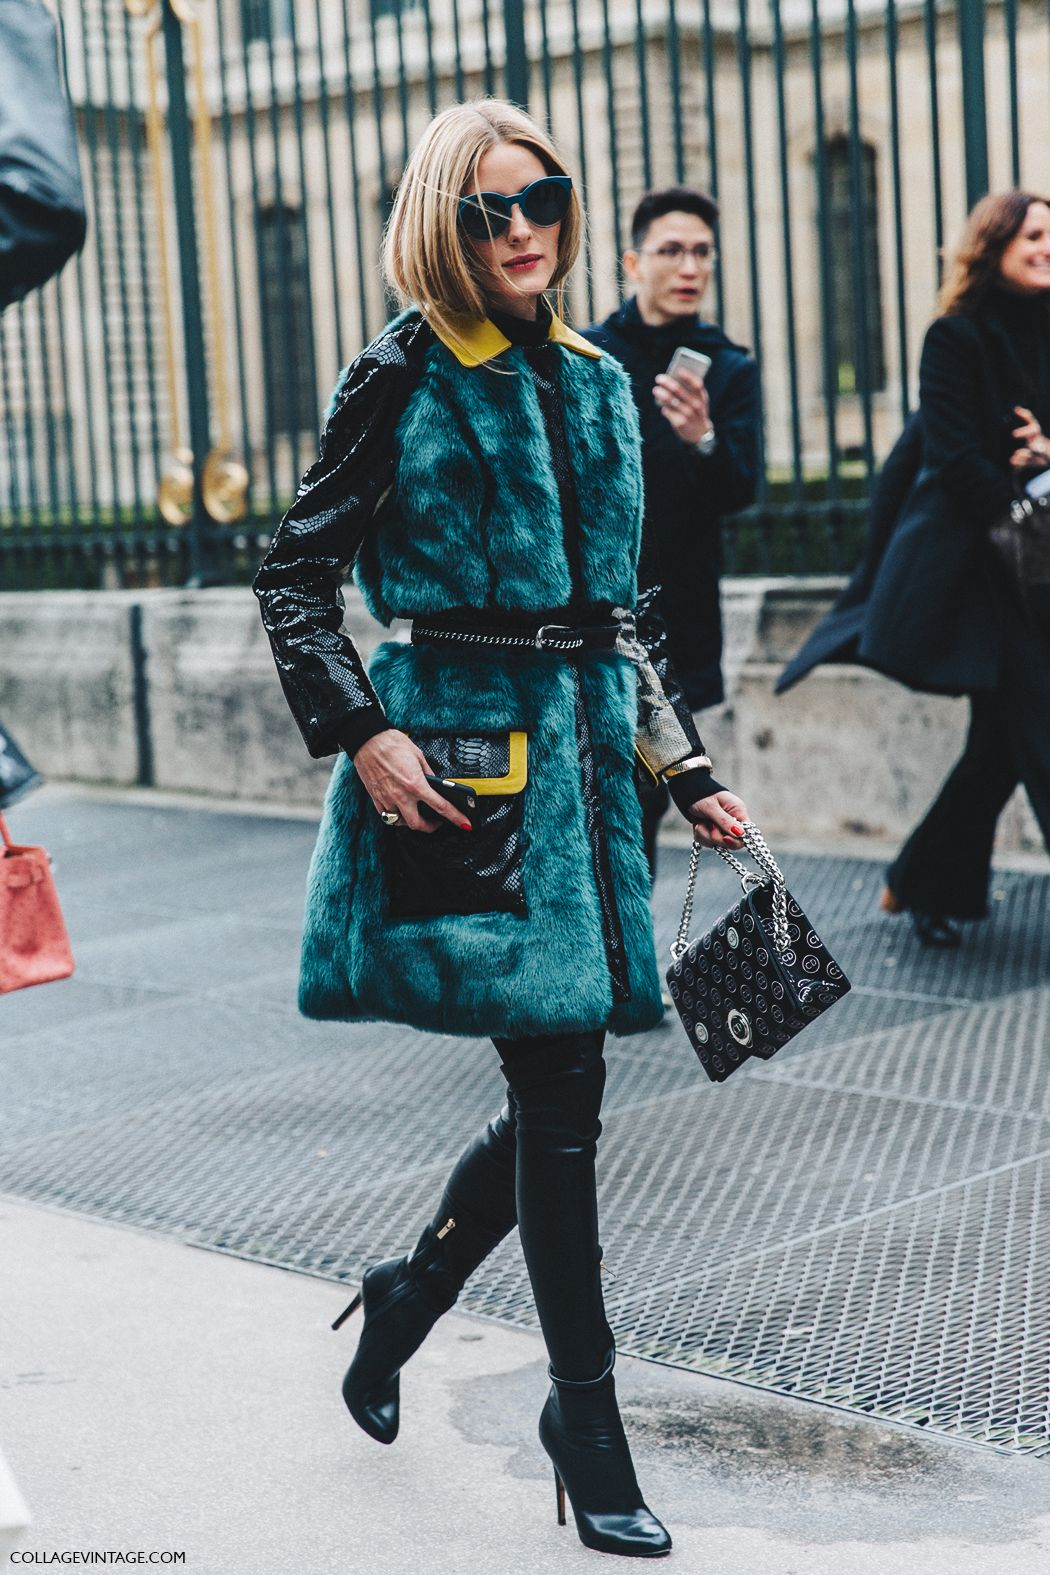 Fwspectator Fashion Week Spectator Daily Street Style Http Just It